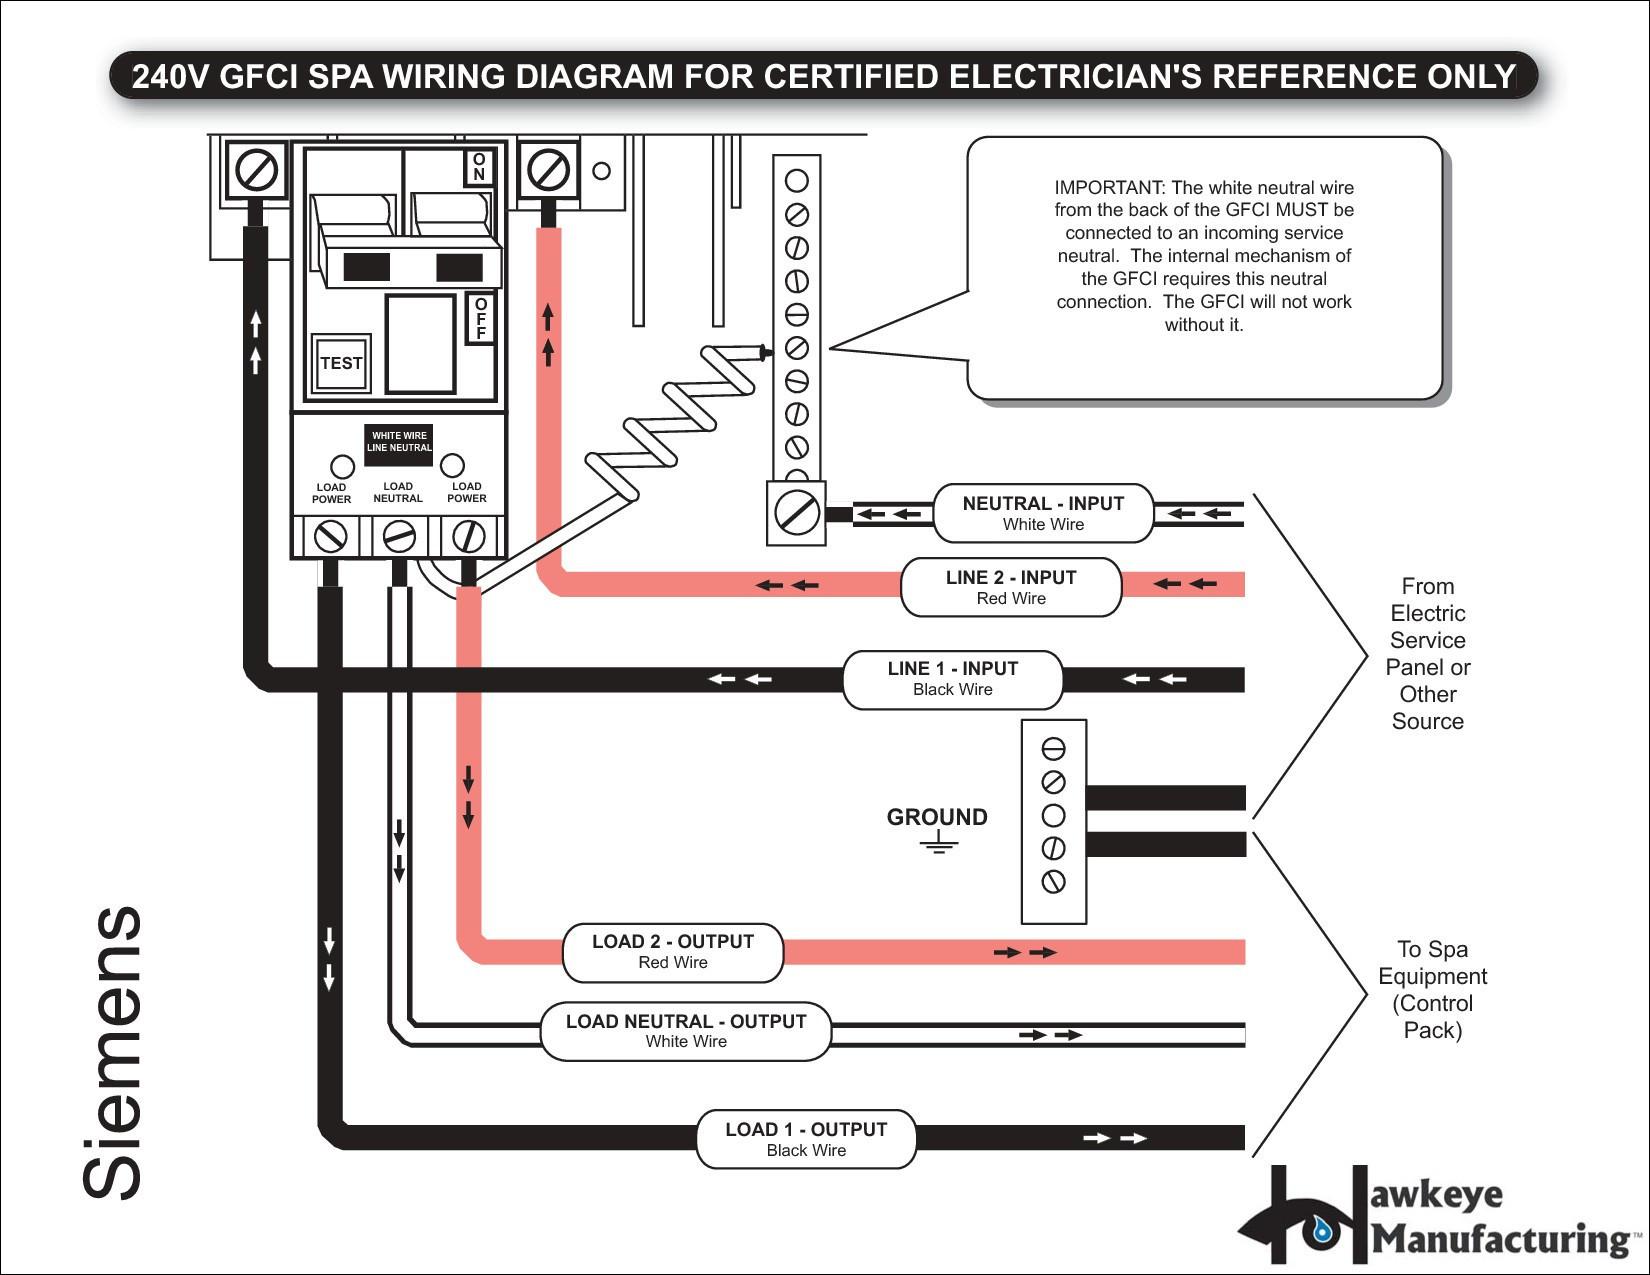 Wiring Diagram Gfci Breaker Example Of Wiring Diagram Gfci Outlet - Gfci Breaker Wiring Diagram